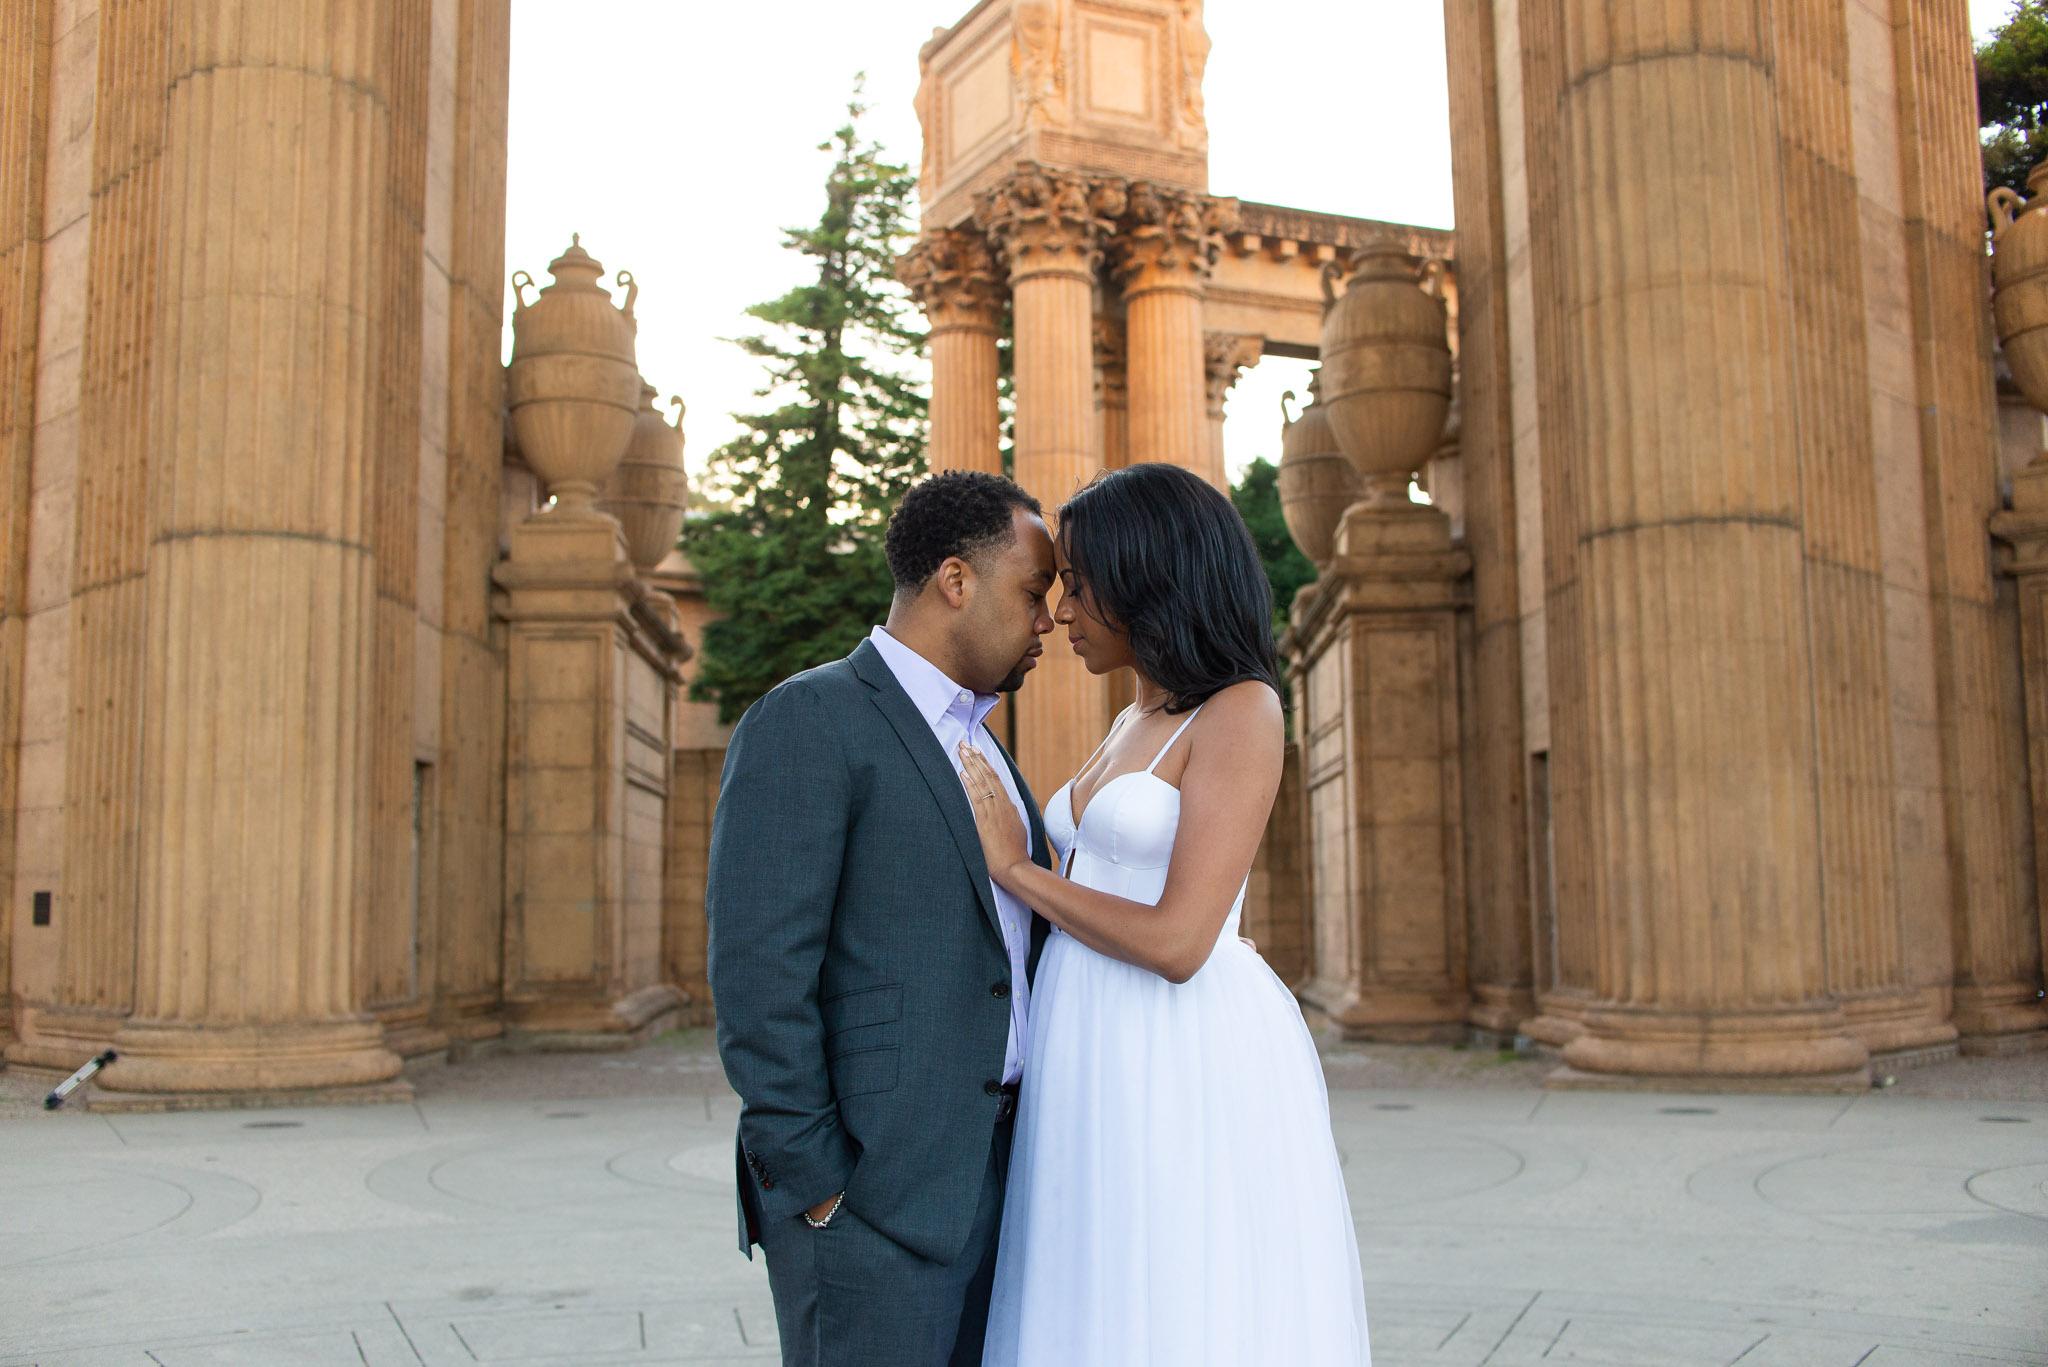 Elopement Engagement Photographer Orange County CA-22.jpg